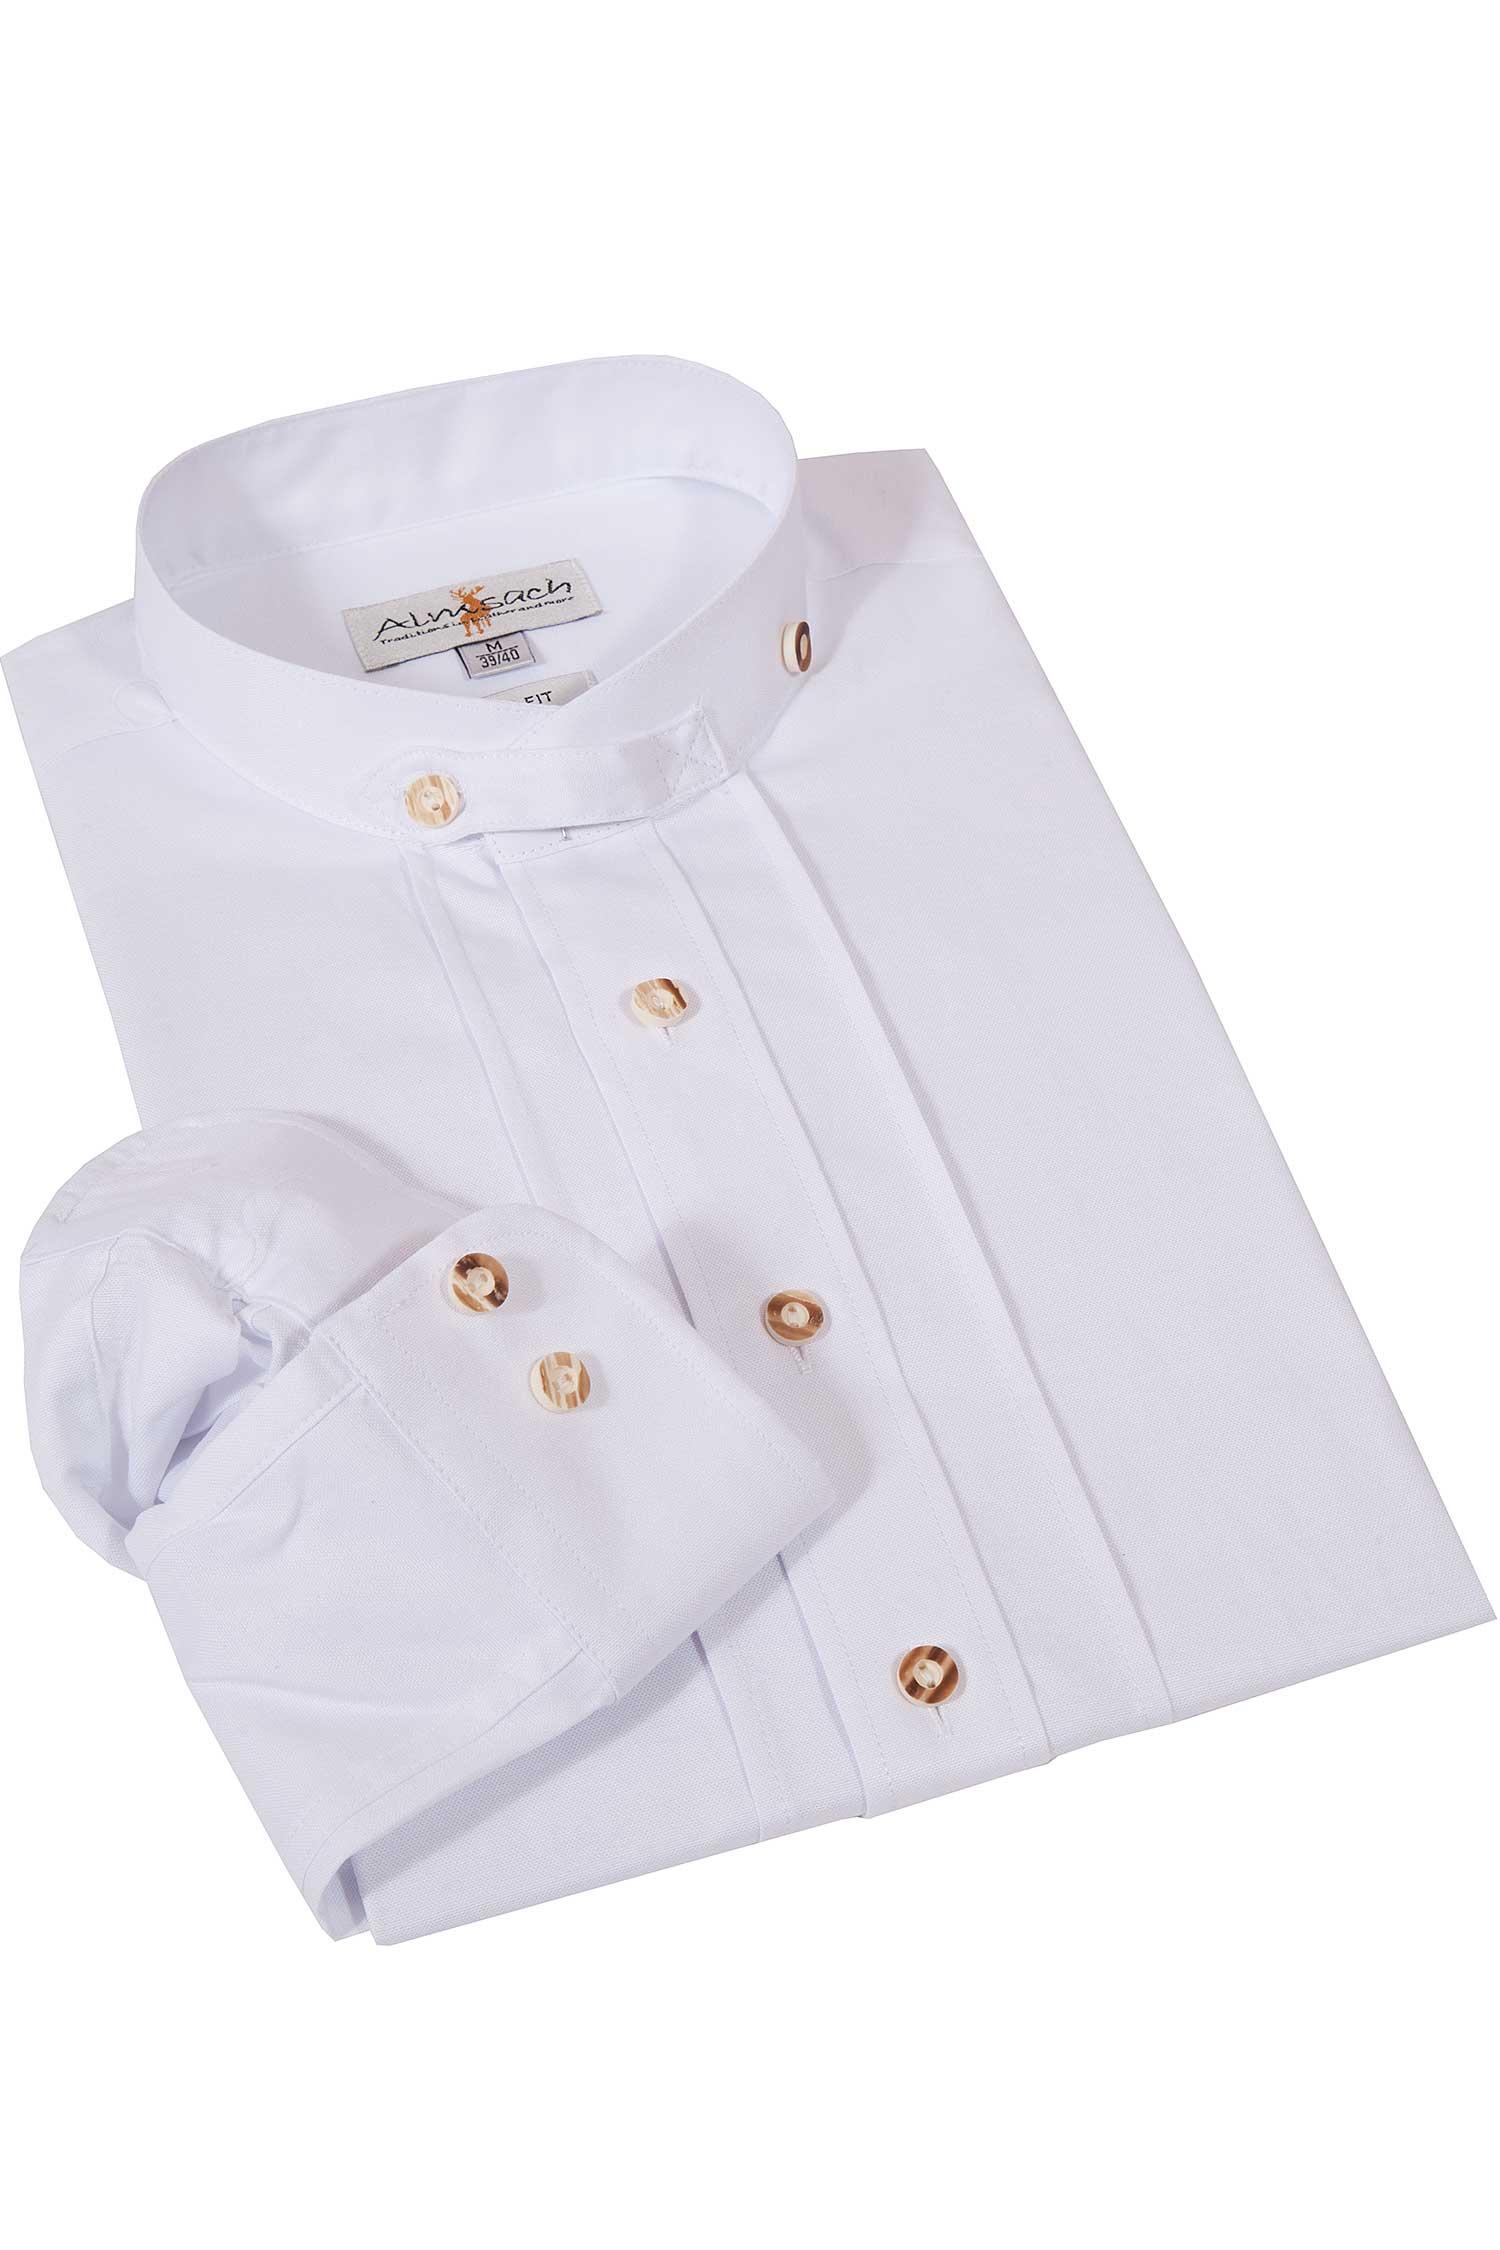 OS Tracht versch Kinder Trachtenhemd weiß Größen Krempelarm